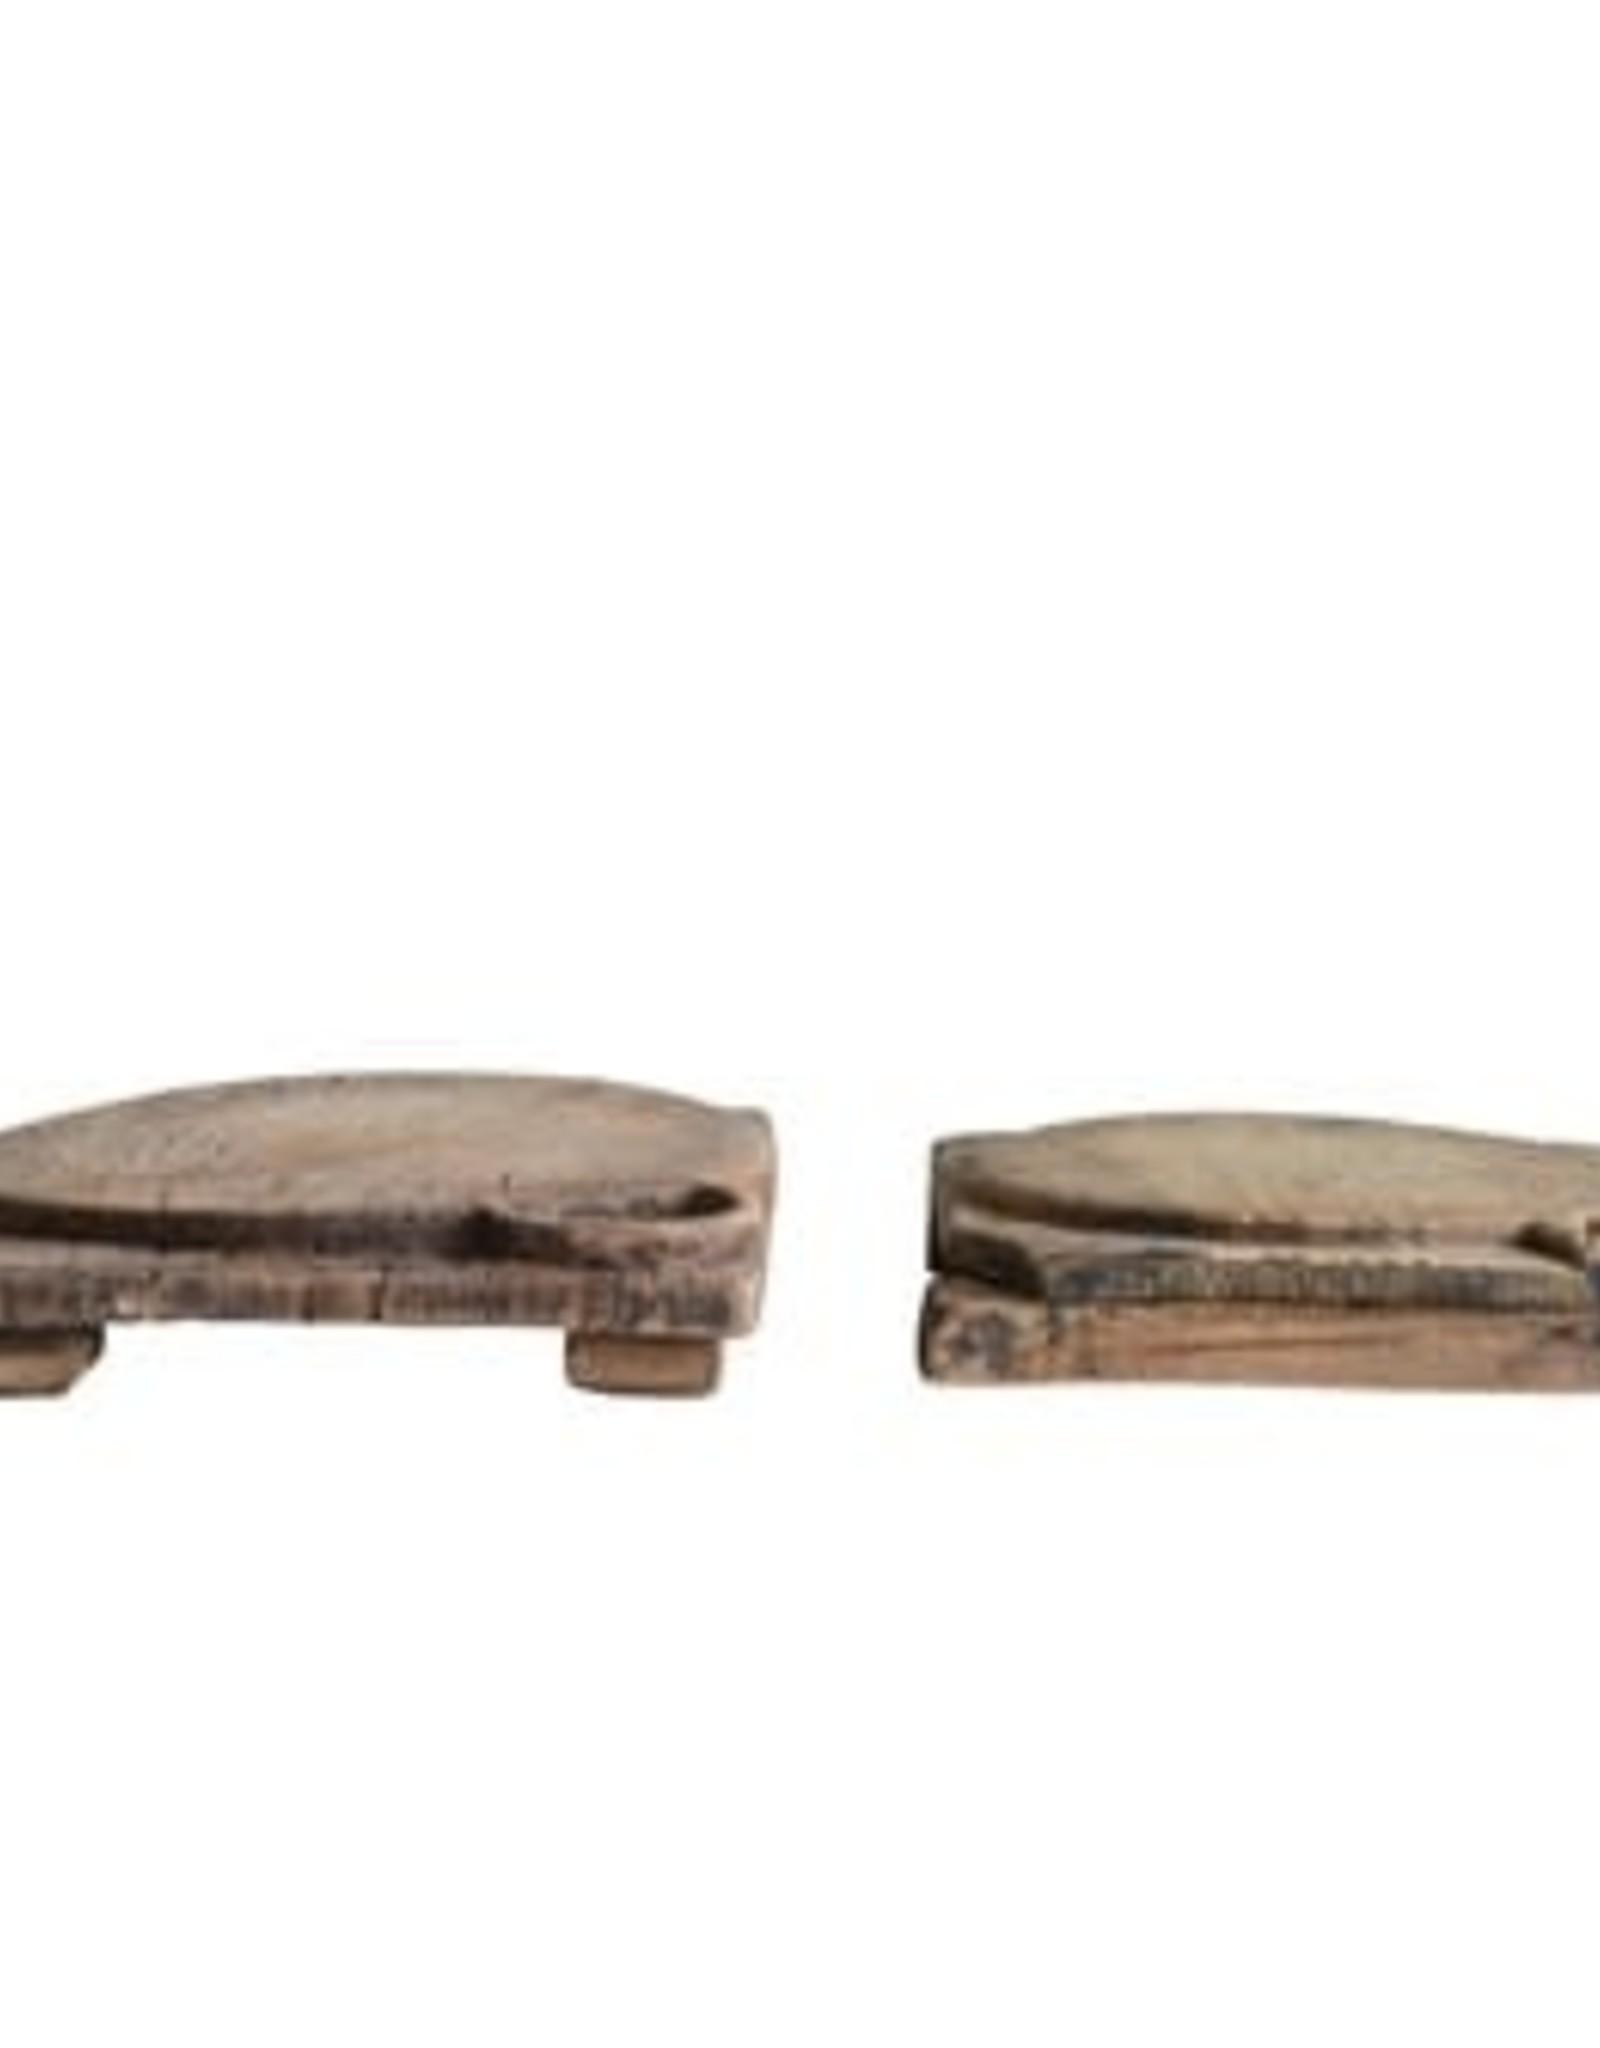 Website *Found Decorative Wood Riser